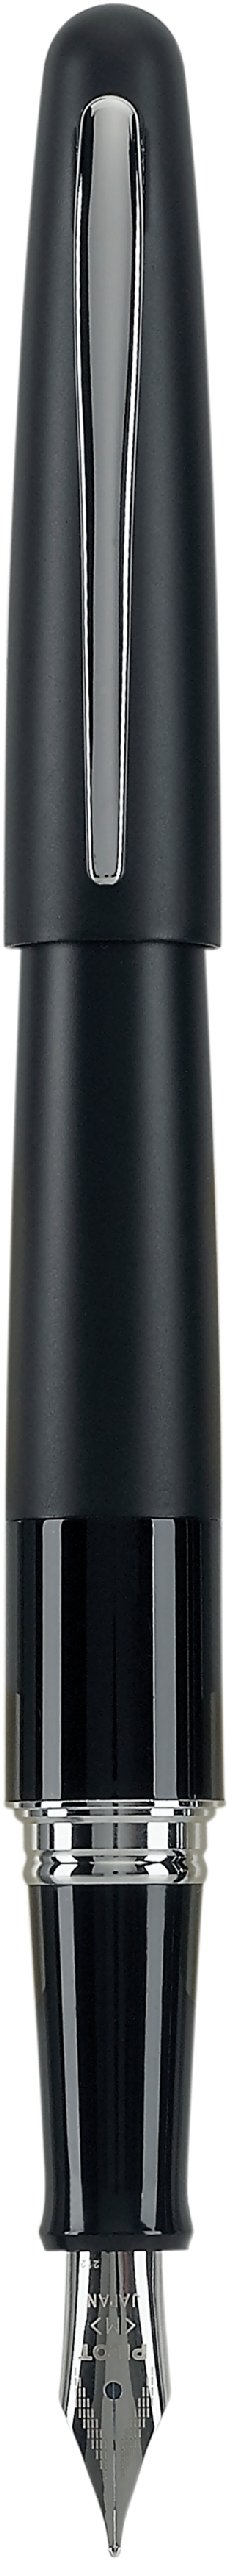 PILOT Metropolitan Collection Fountain Pen, Black Barrel, Classic Design, Fine Nib, Black Ink (91111)